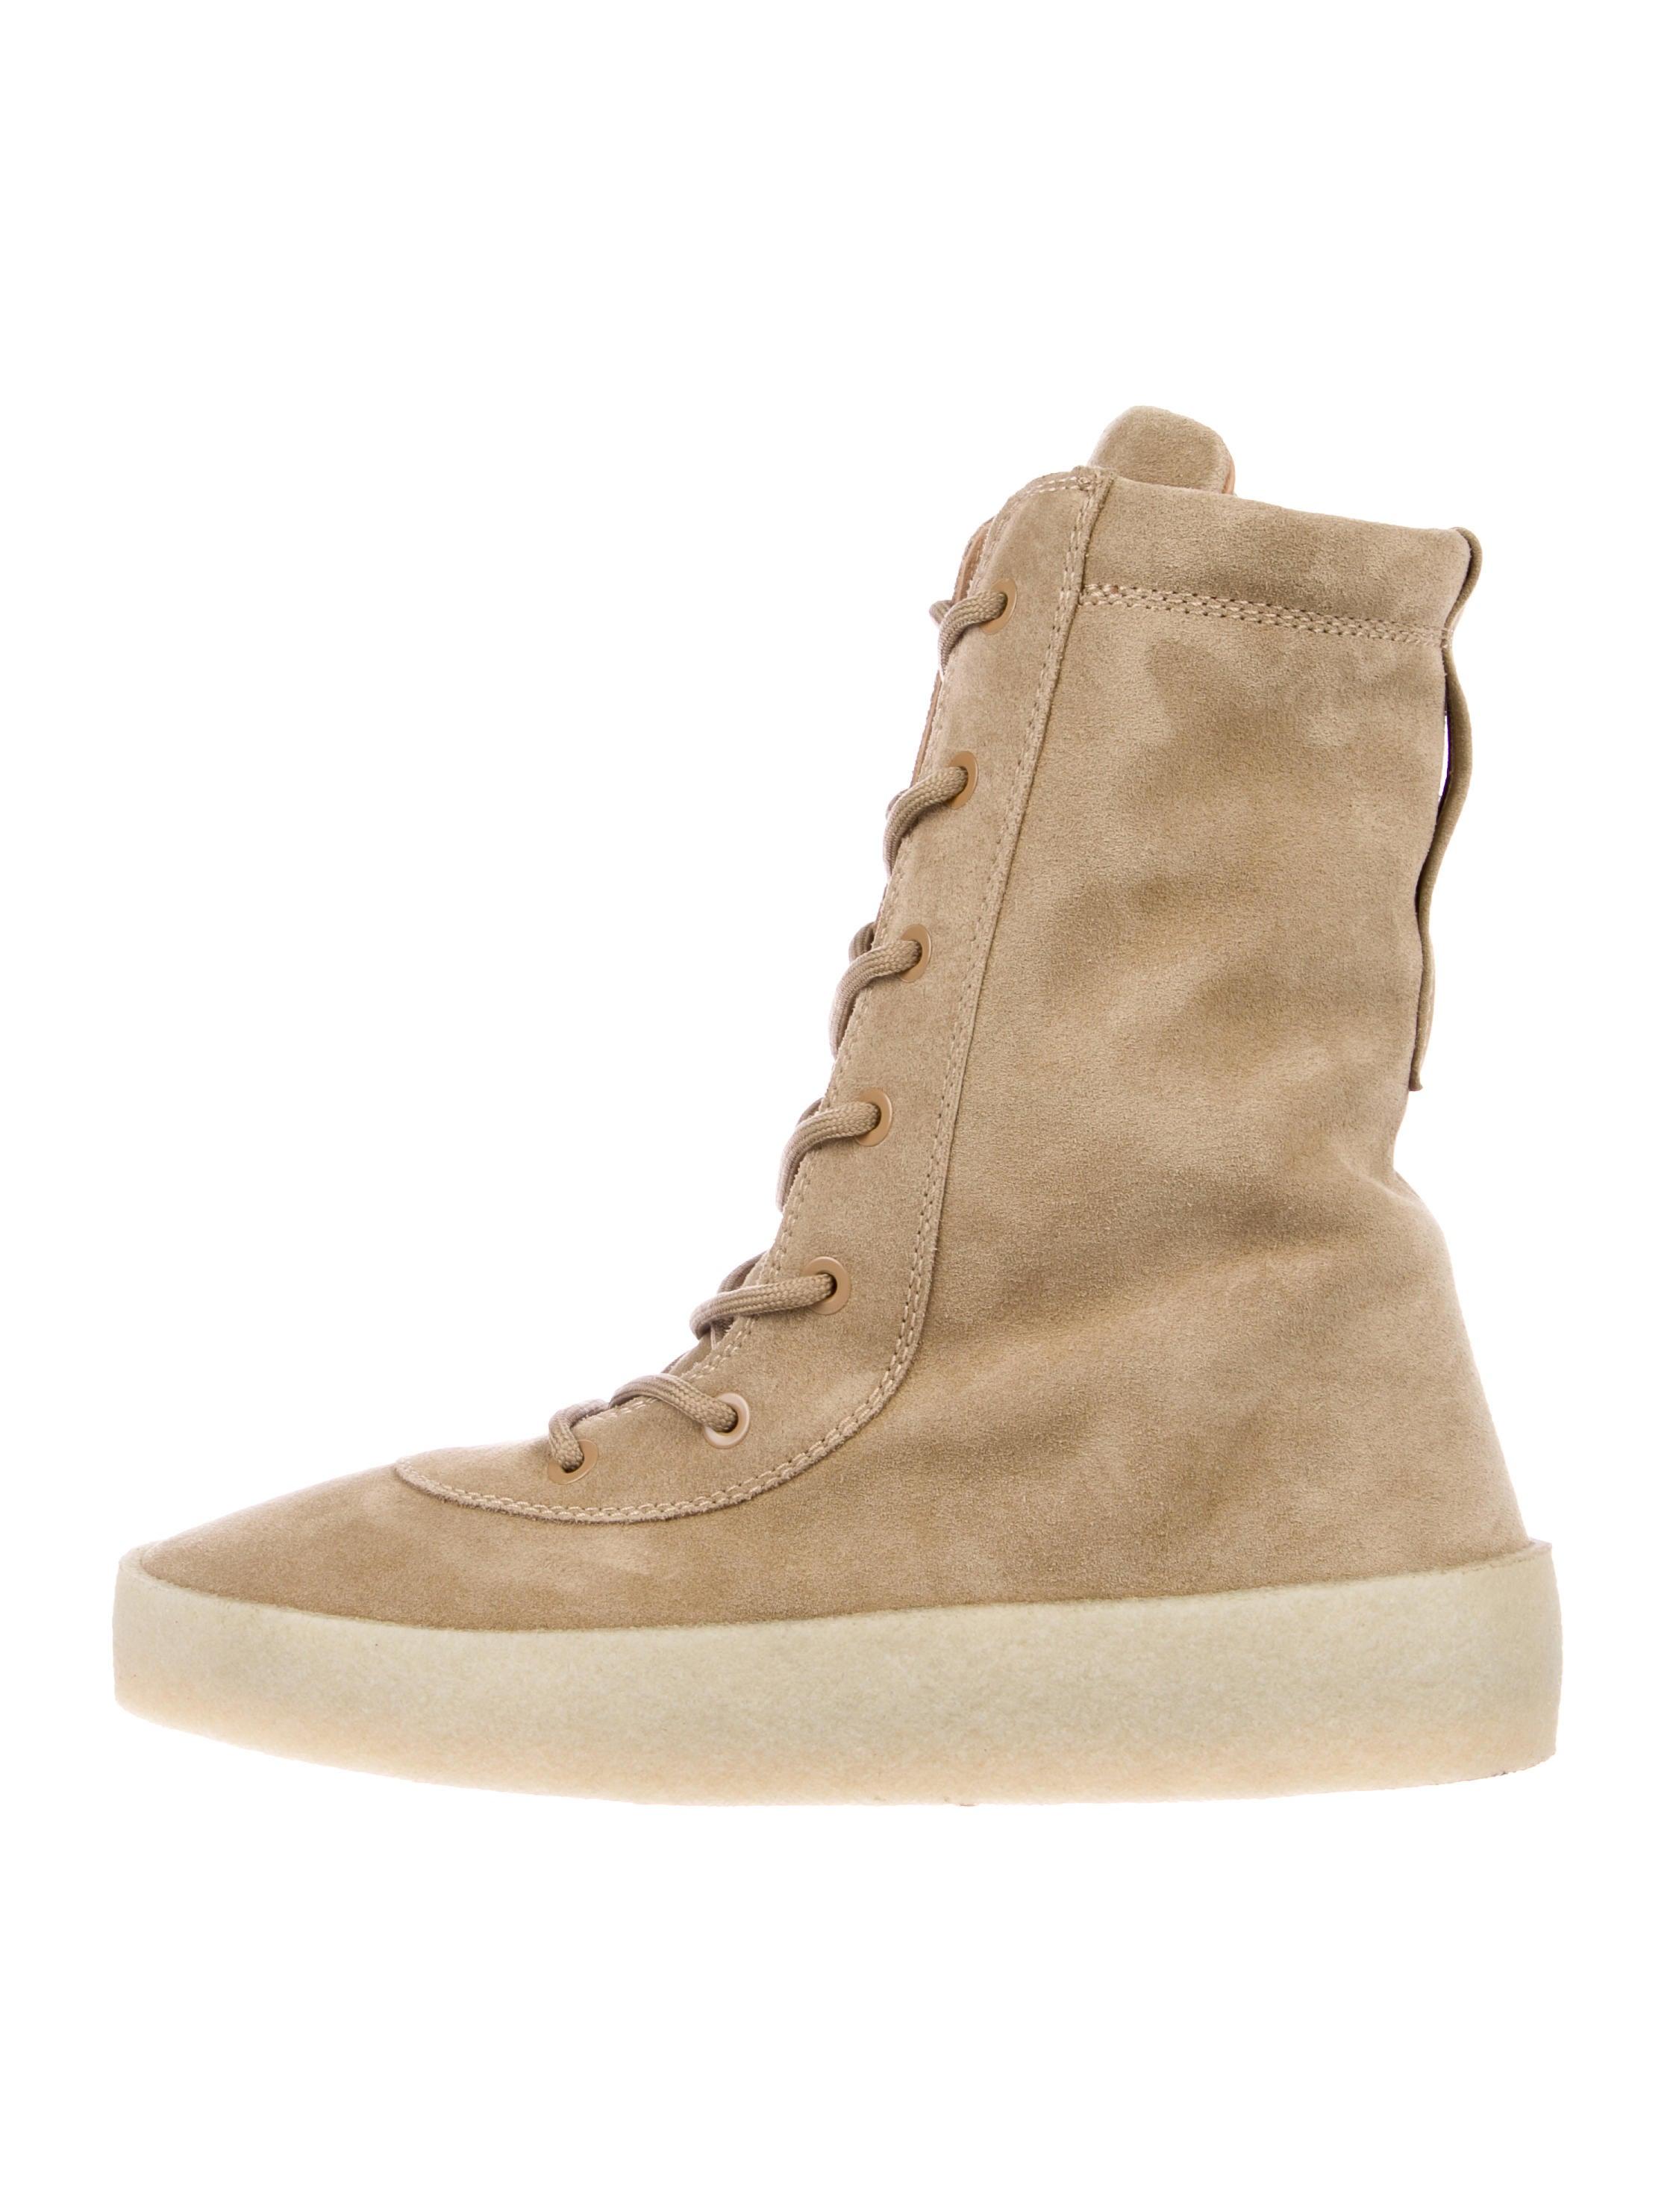 7ddf38d25 Yeezy Season 4 Crepe Boots - Shoes - WYEEZ21079